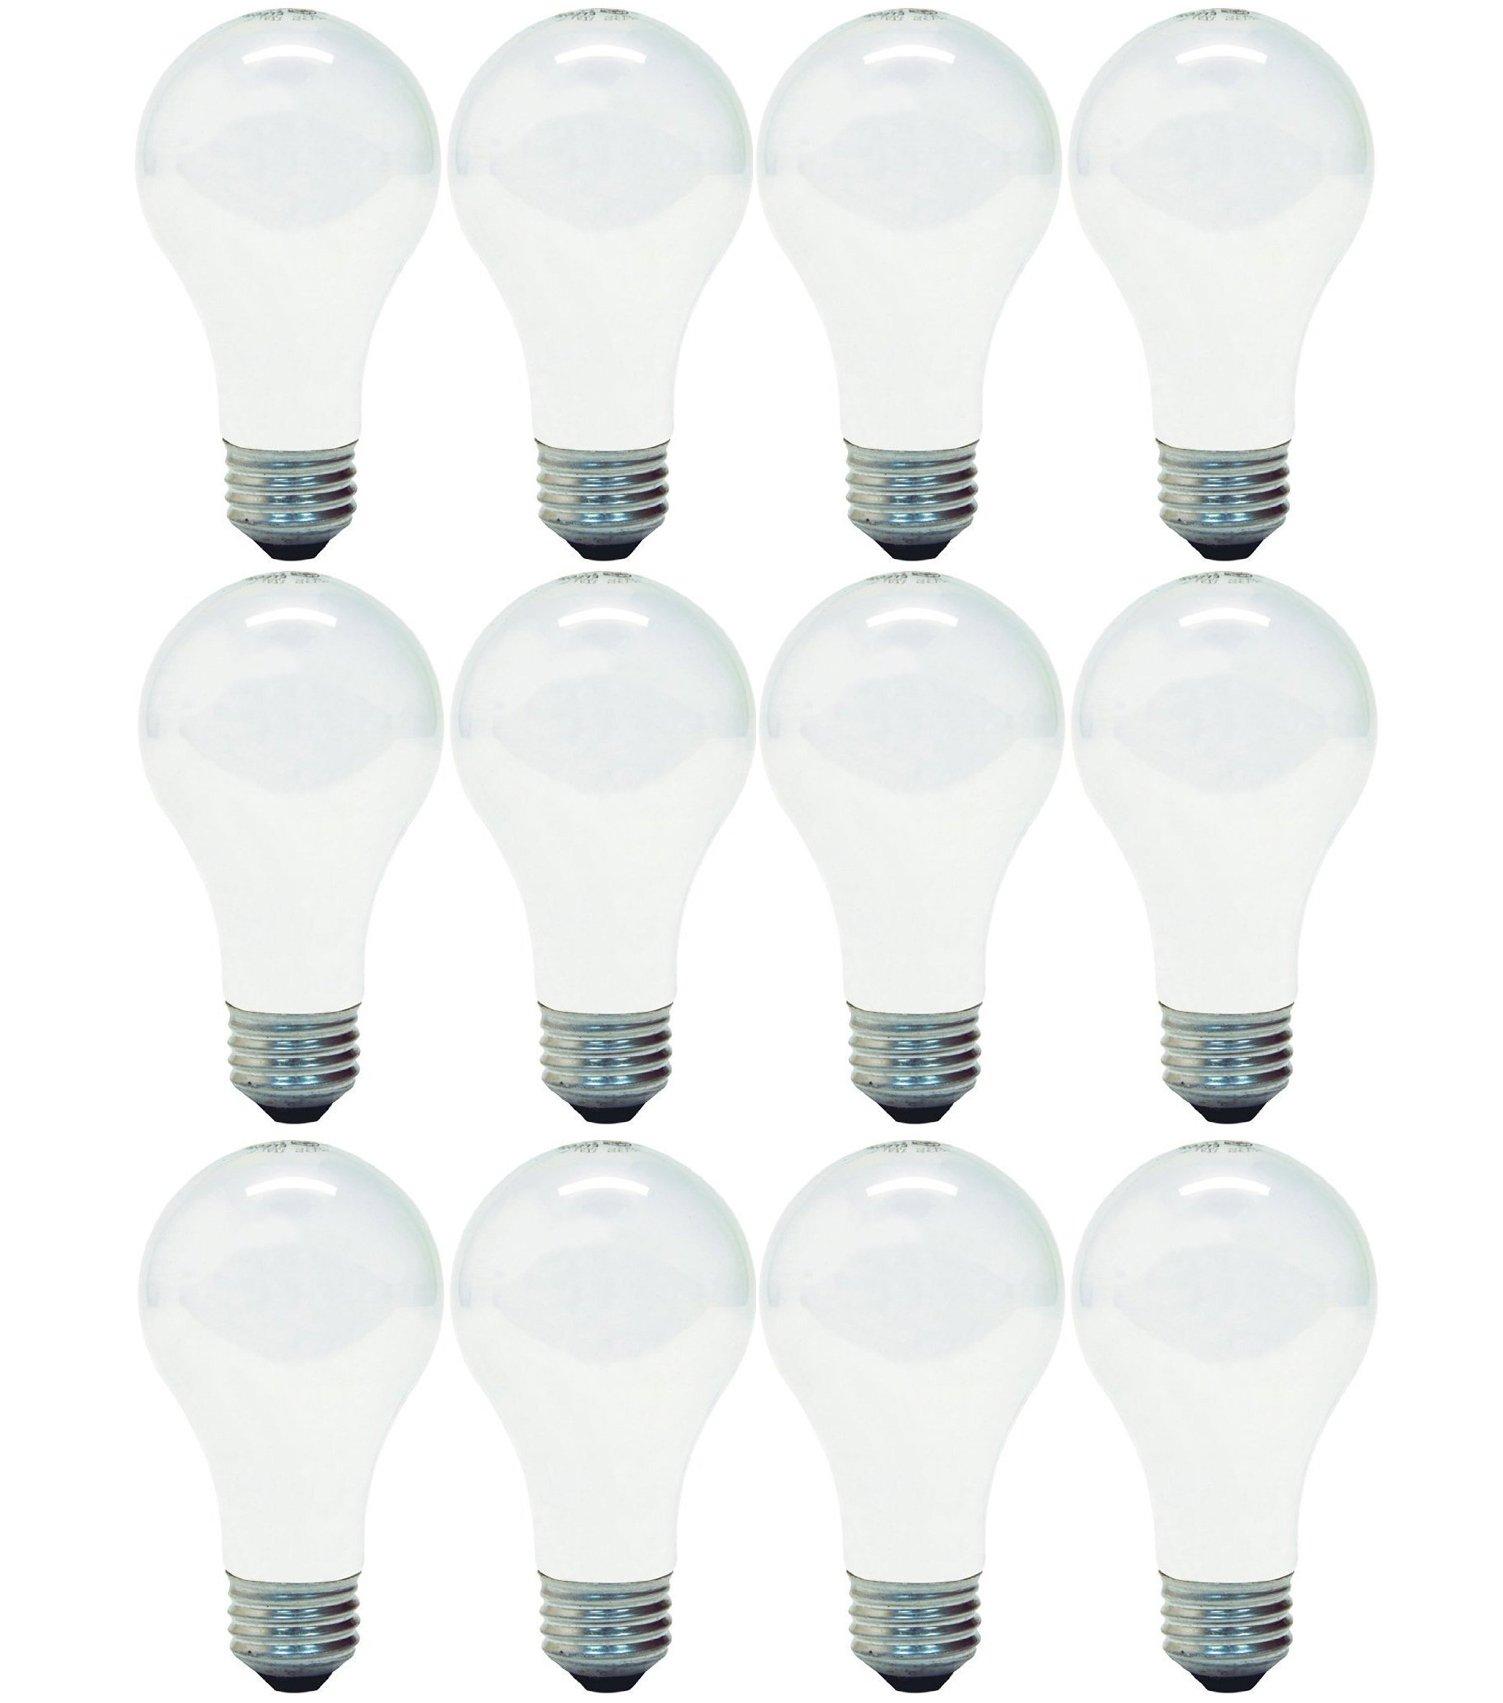 GE Lighting 63004 Soft White 53-Watt (75-watt replacement) 1050-Lumen A19 Light Bulb with Medium Base, 12-Pack